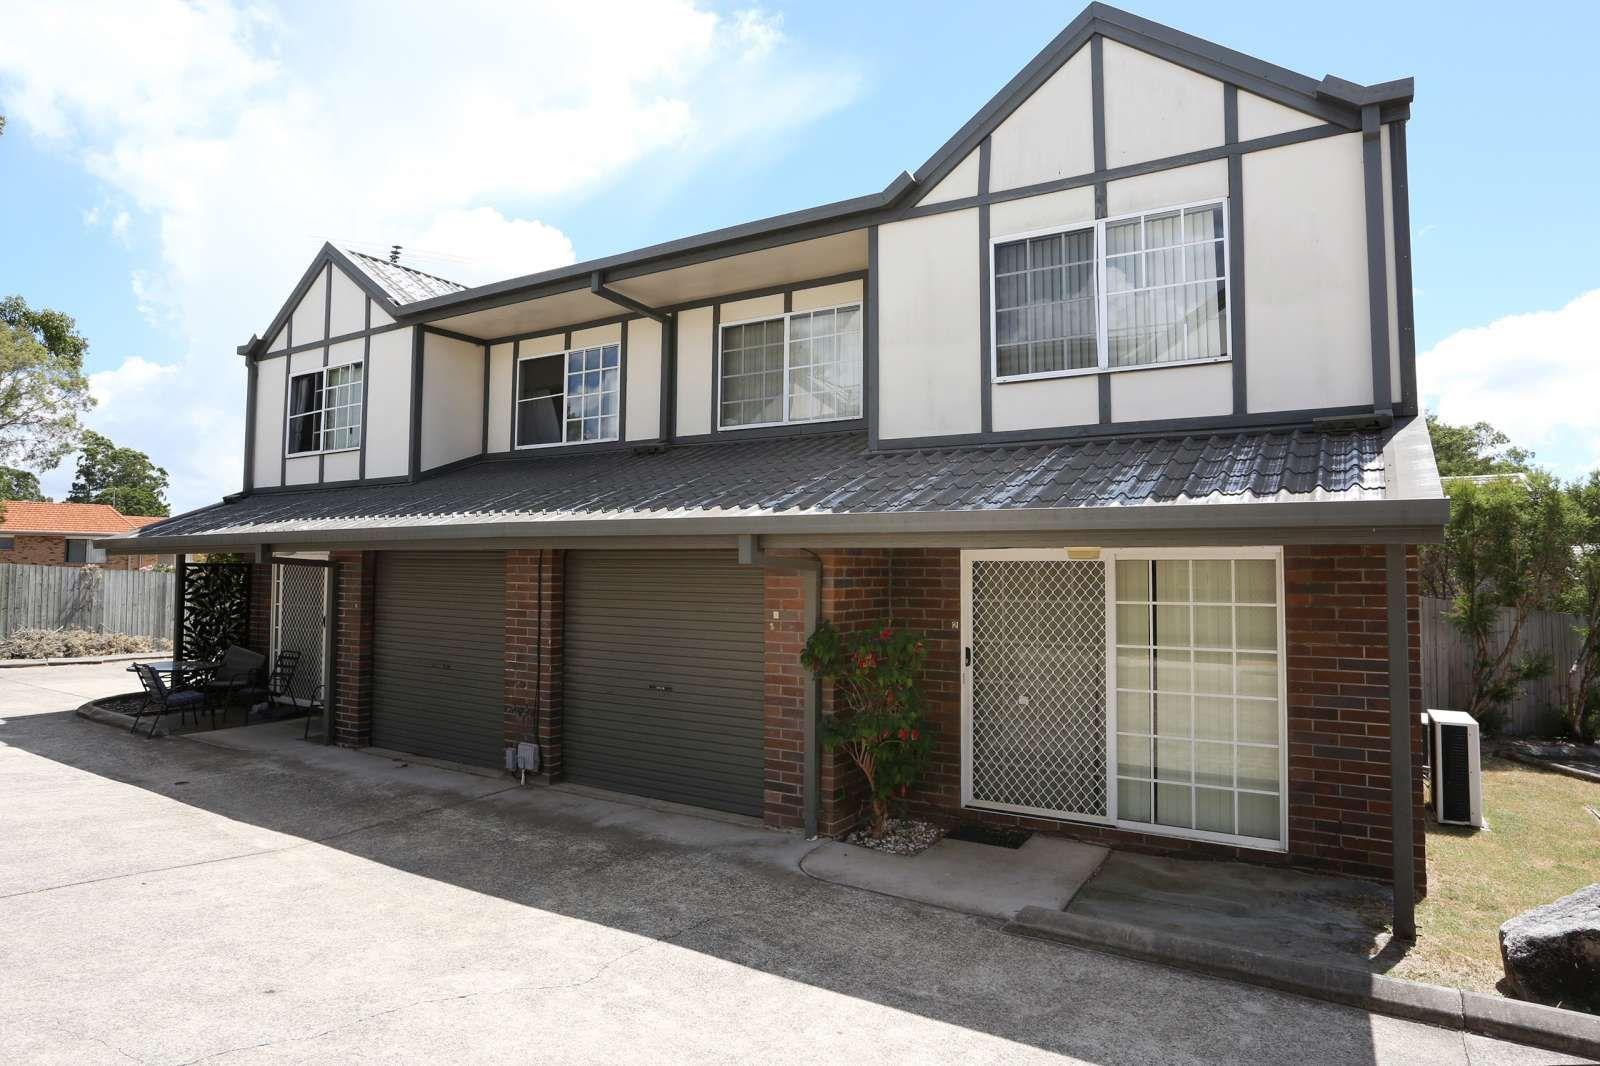 2/4 Pendlebury Court, Edens Landing QLD 4207, Image 0